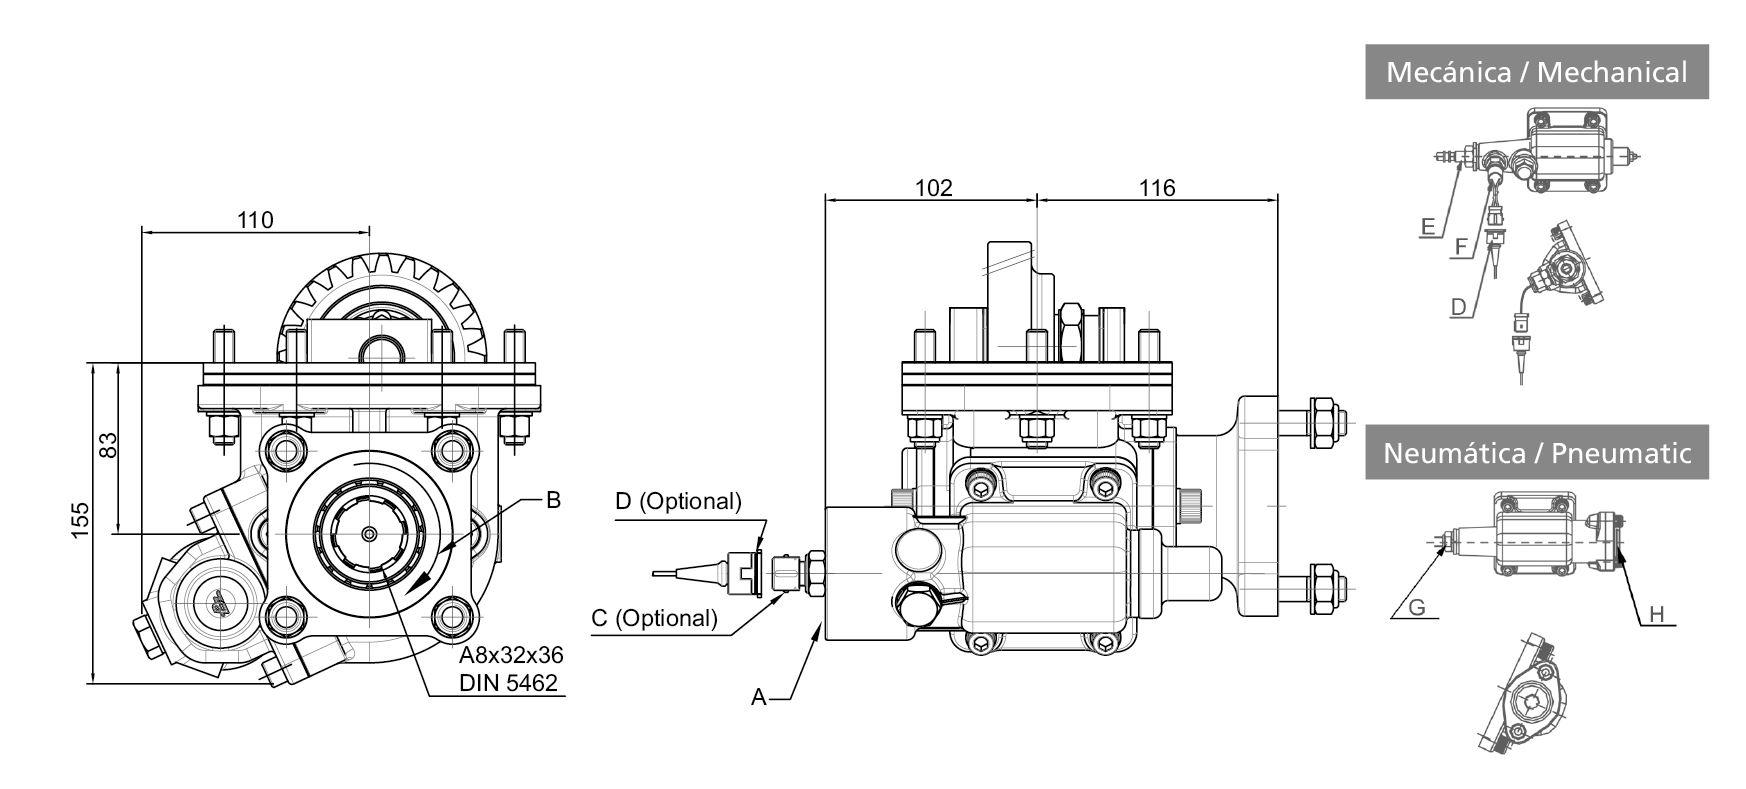 068503 side mount vacuum - single acting